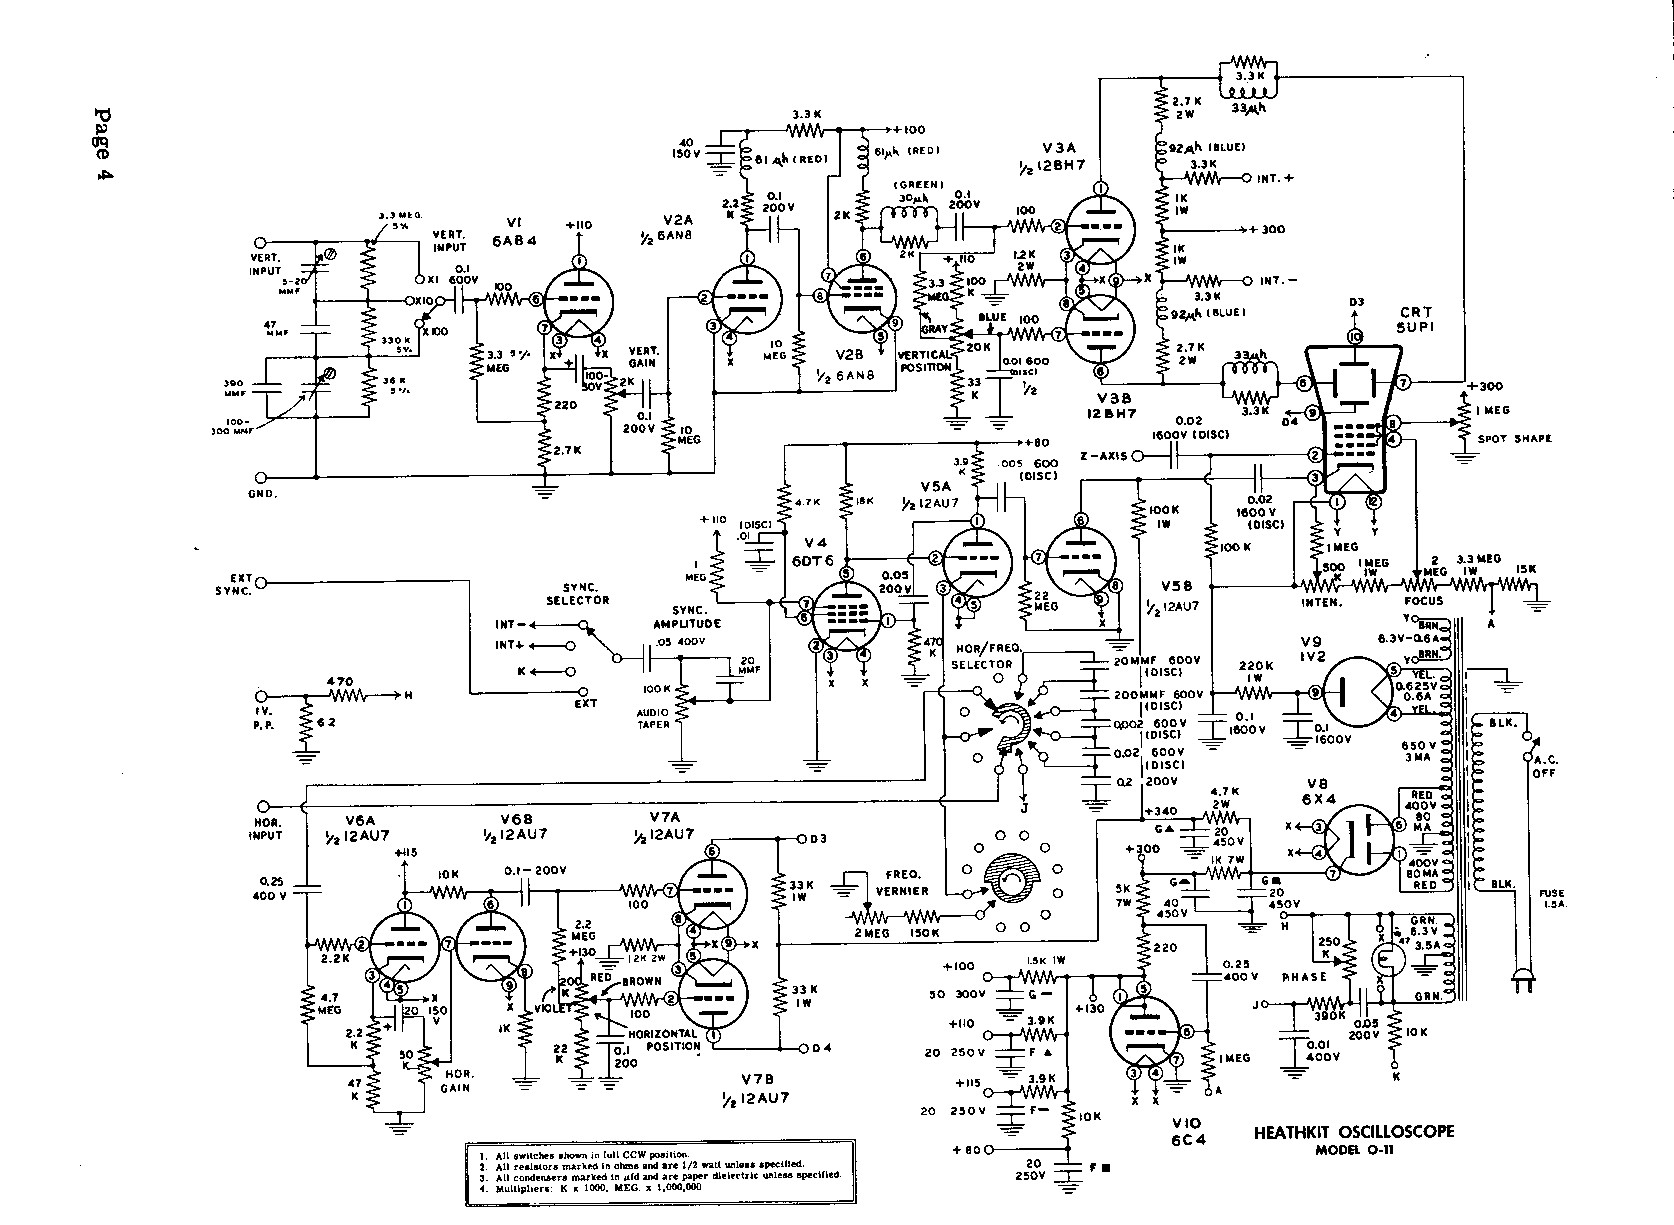 Electronics Kits Bfo Metal Detectors Circuit Diagram Electronic Circuits Oscilloscope Schematic Heathkit O 11 Schematics